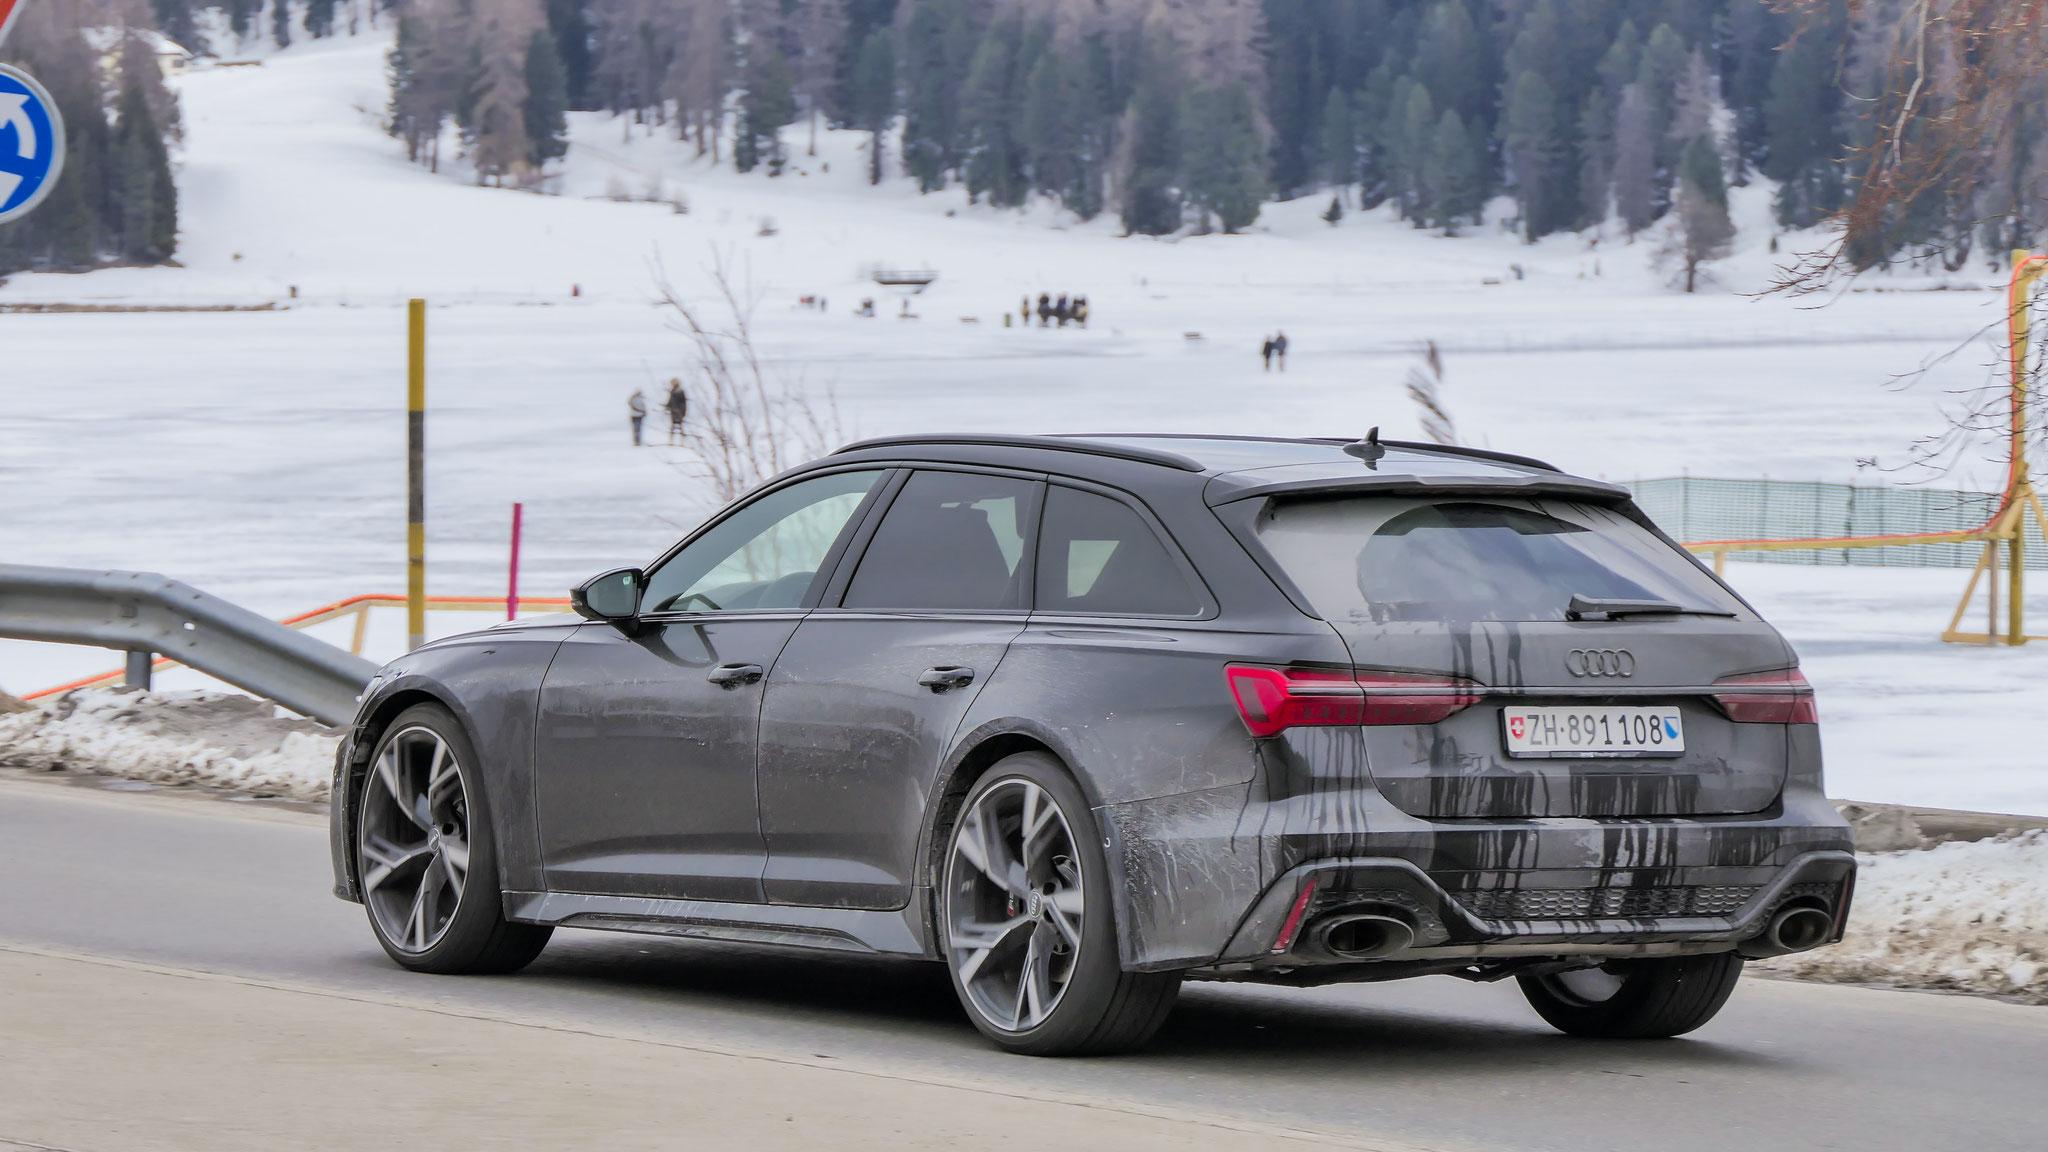 Audi RS6 - ZH-891108 (CH)